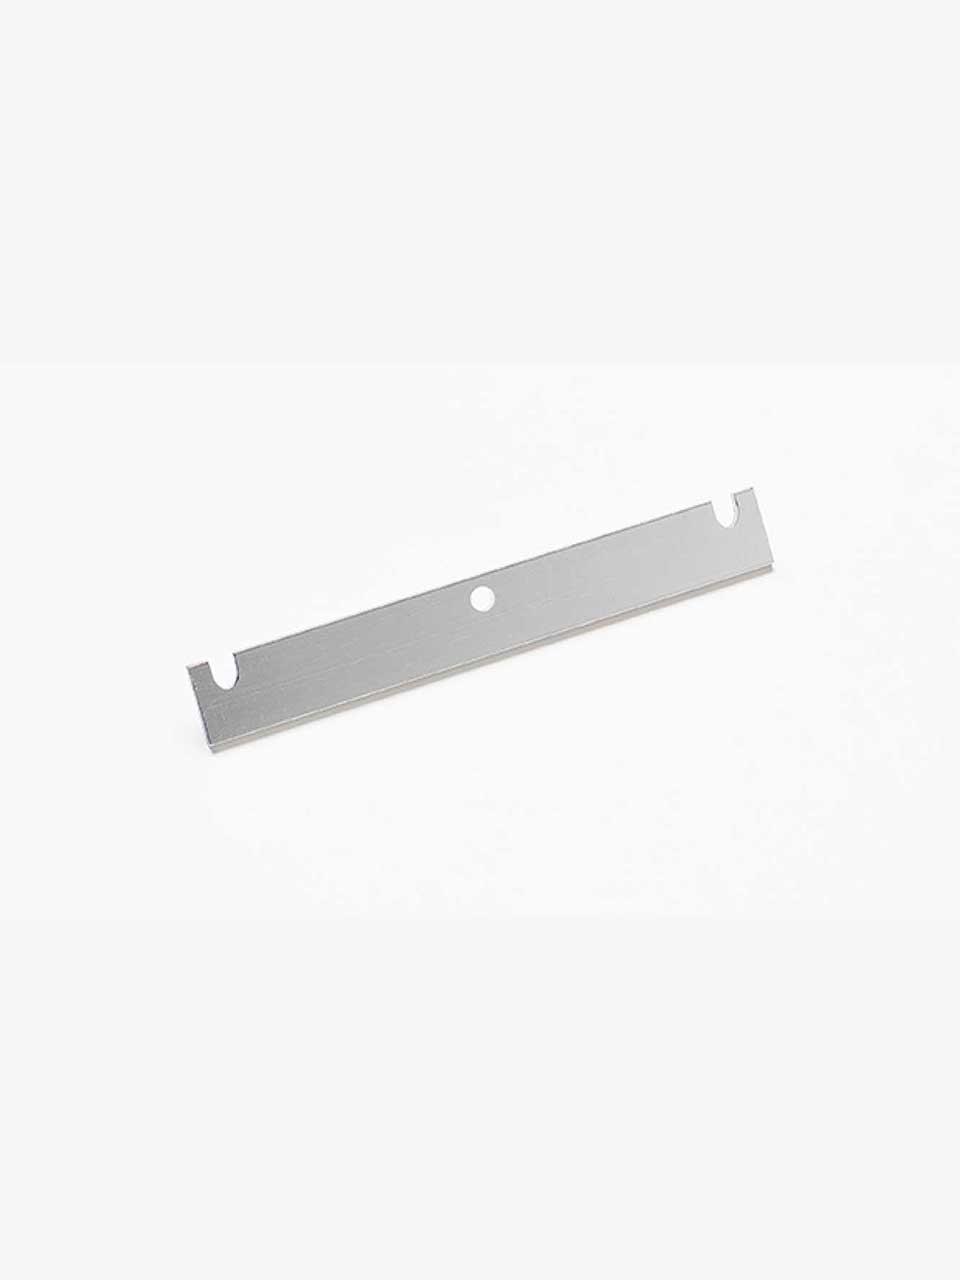 spreader bar 15cm